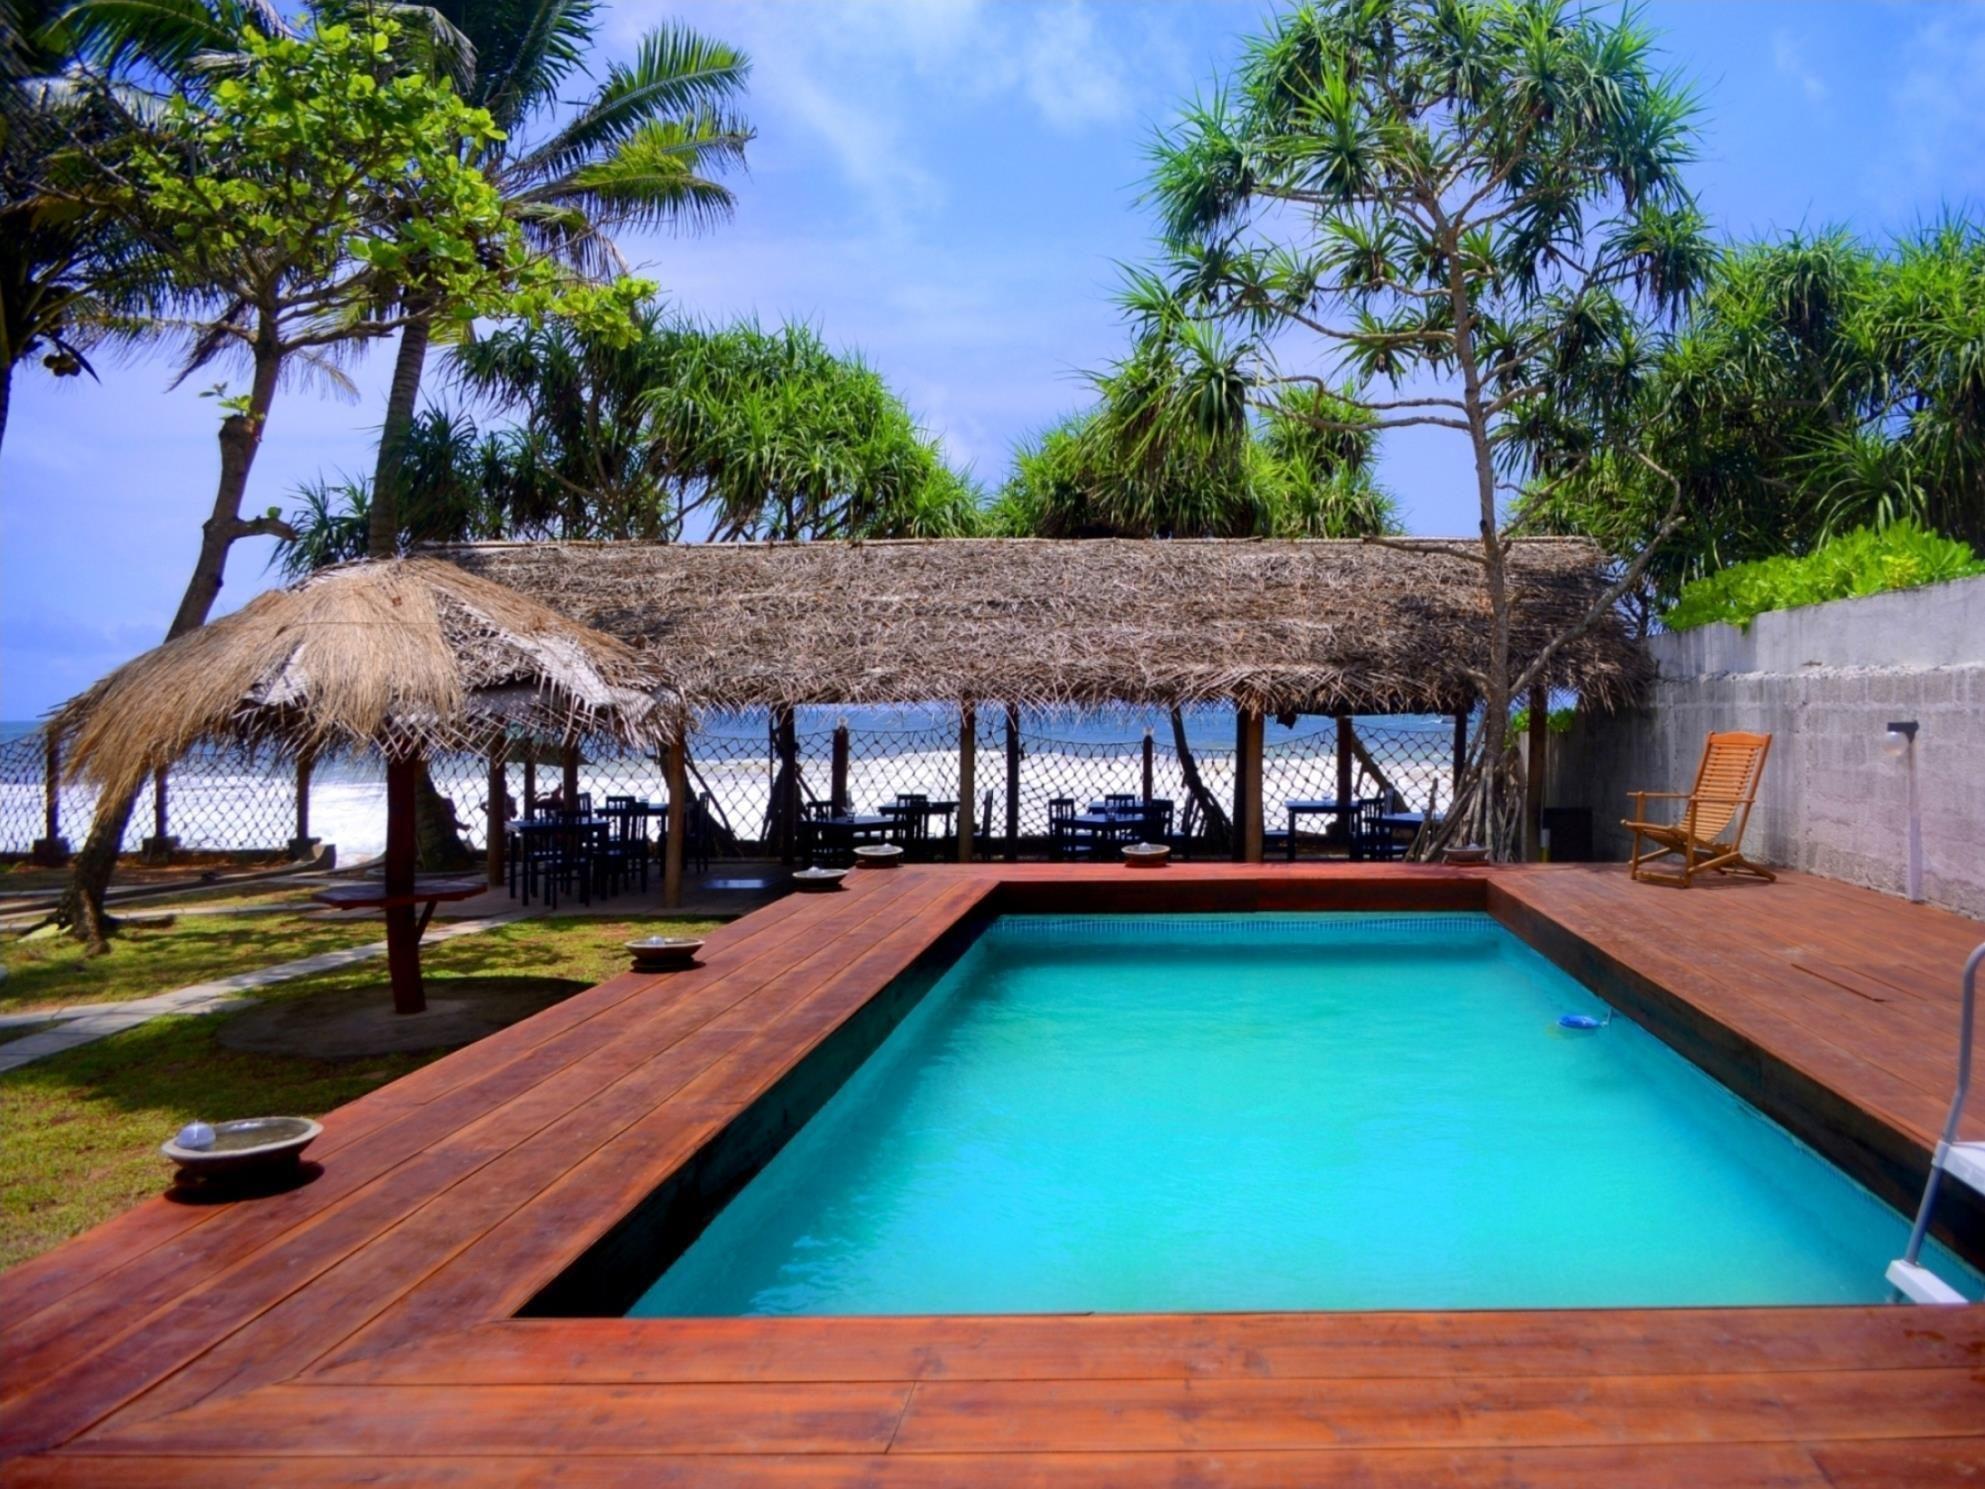 Bentota Villa Amore Mio Beach Sri Lanka Asia Located In Maha Induruwa